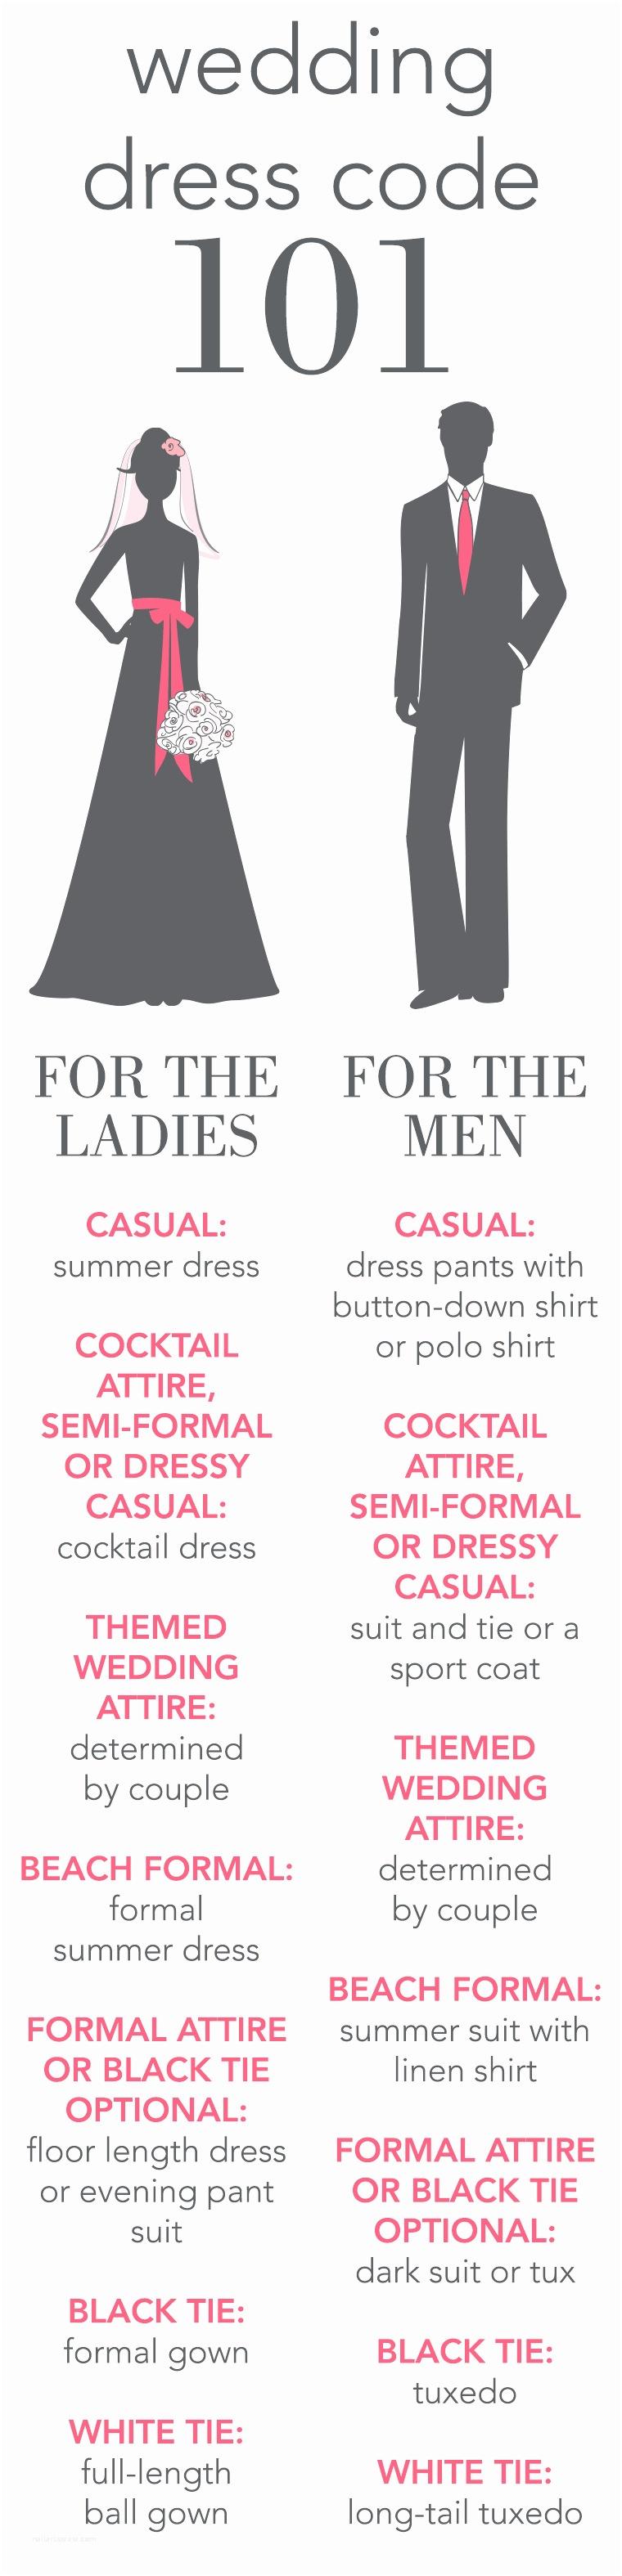 Wedding Invitation Dress Code Wedding Dress Code 101